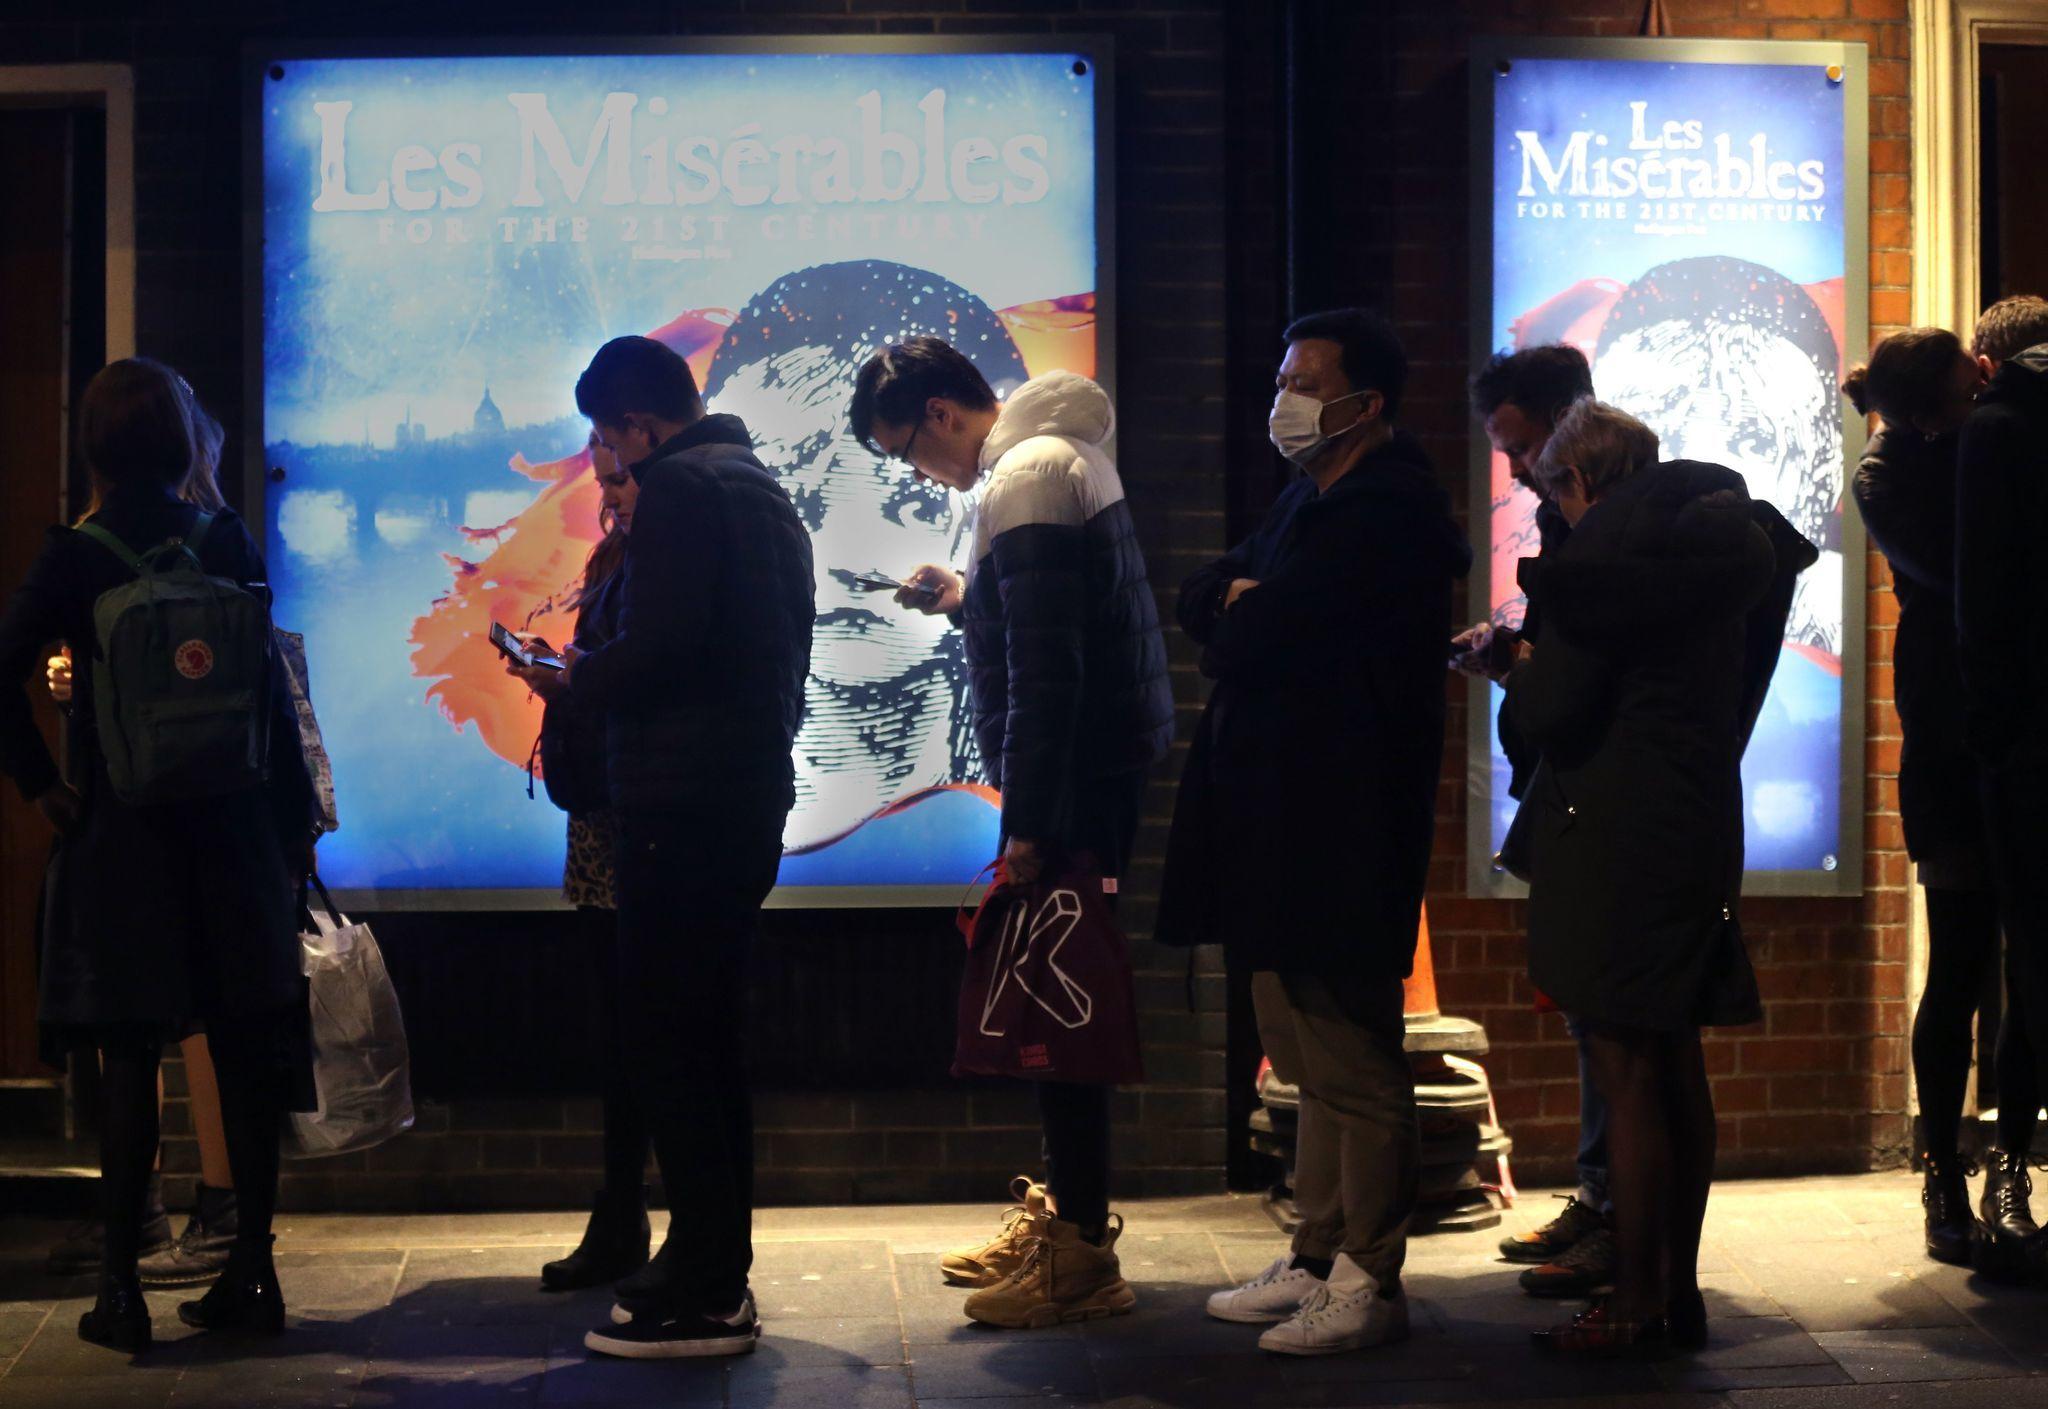 London's West End theater district extends coronavirus shutdown through May